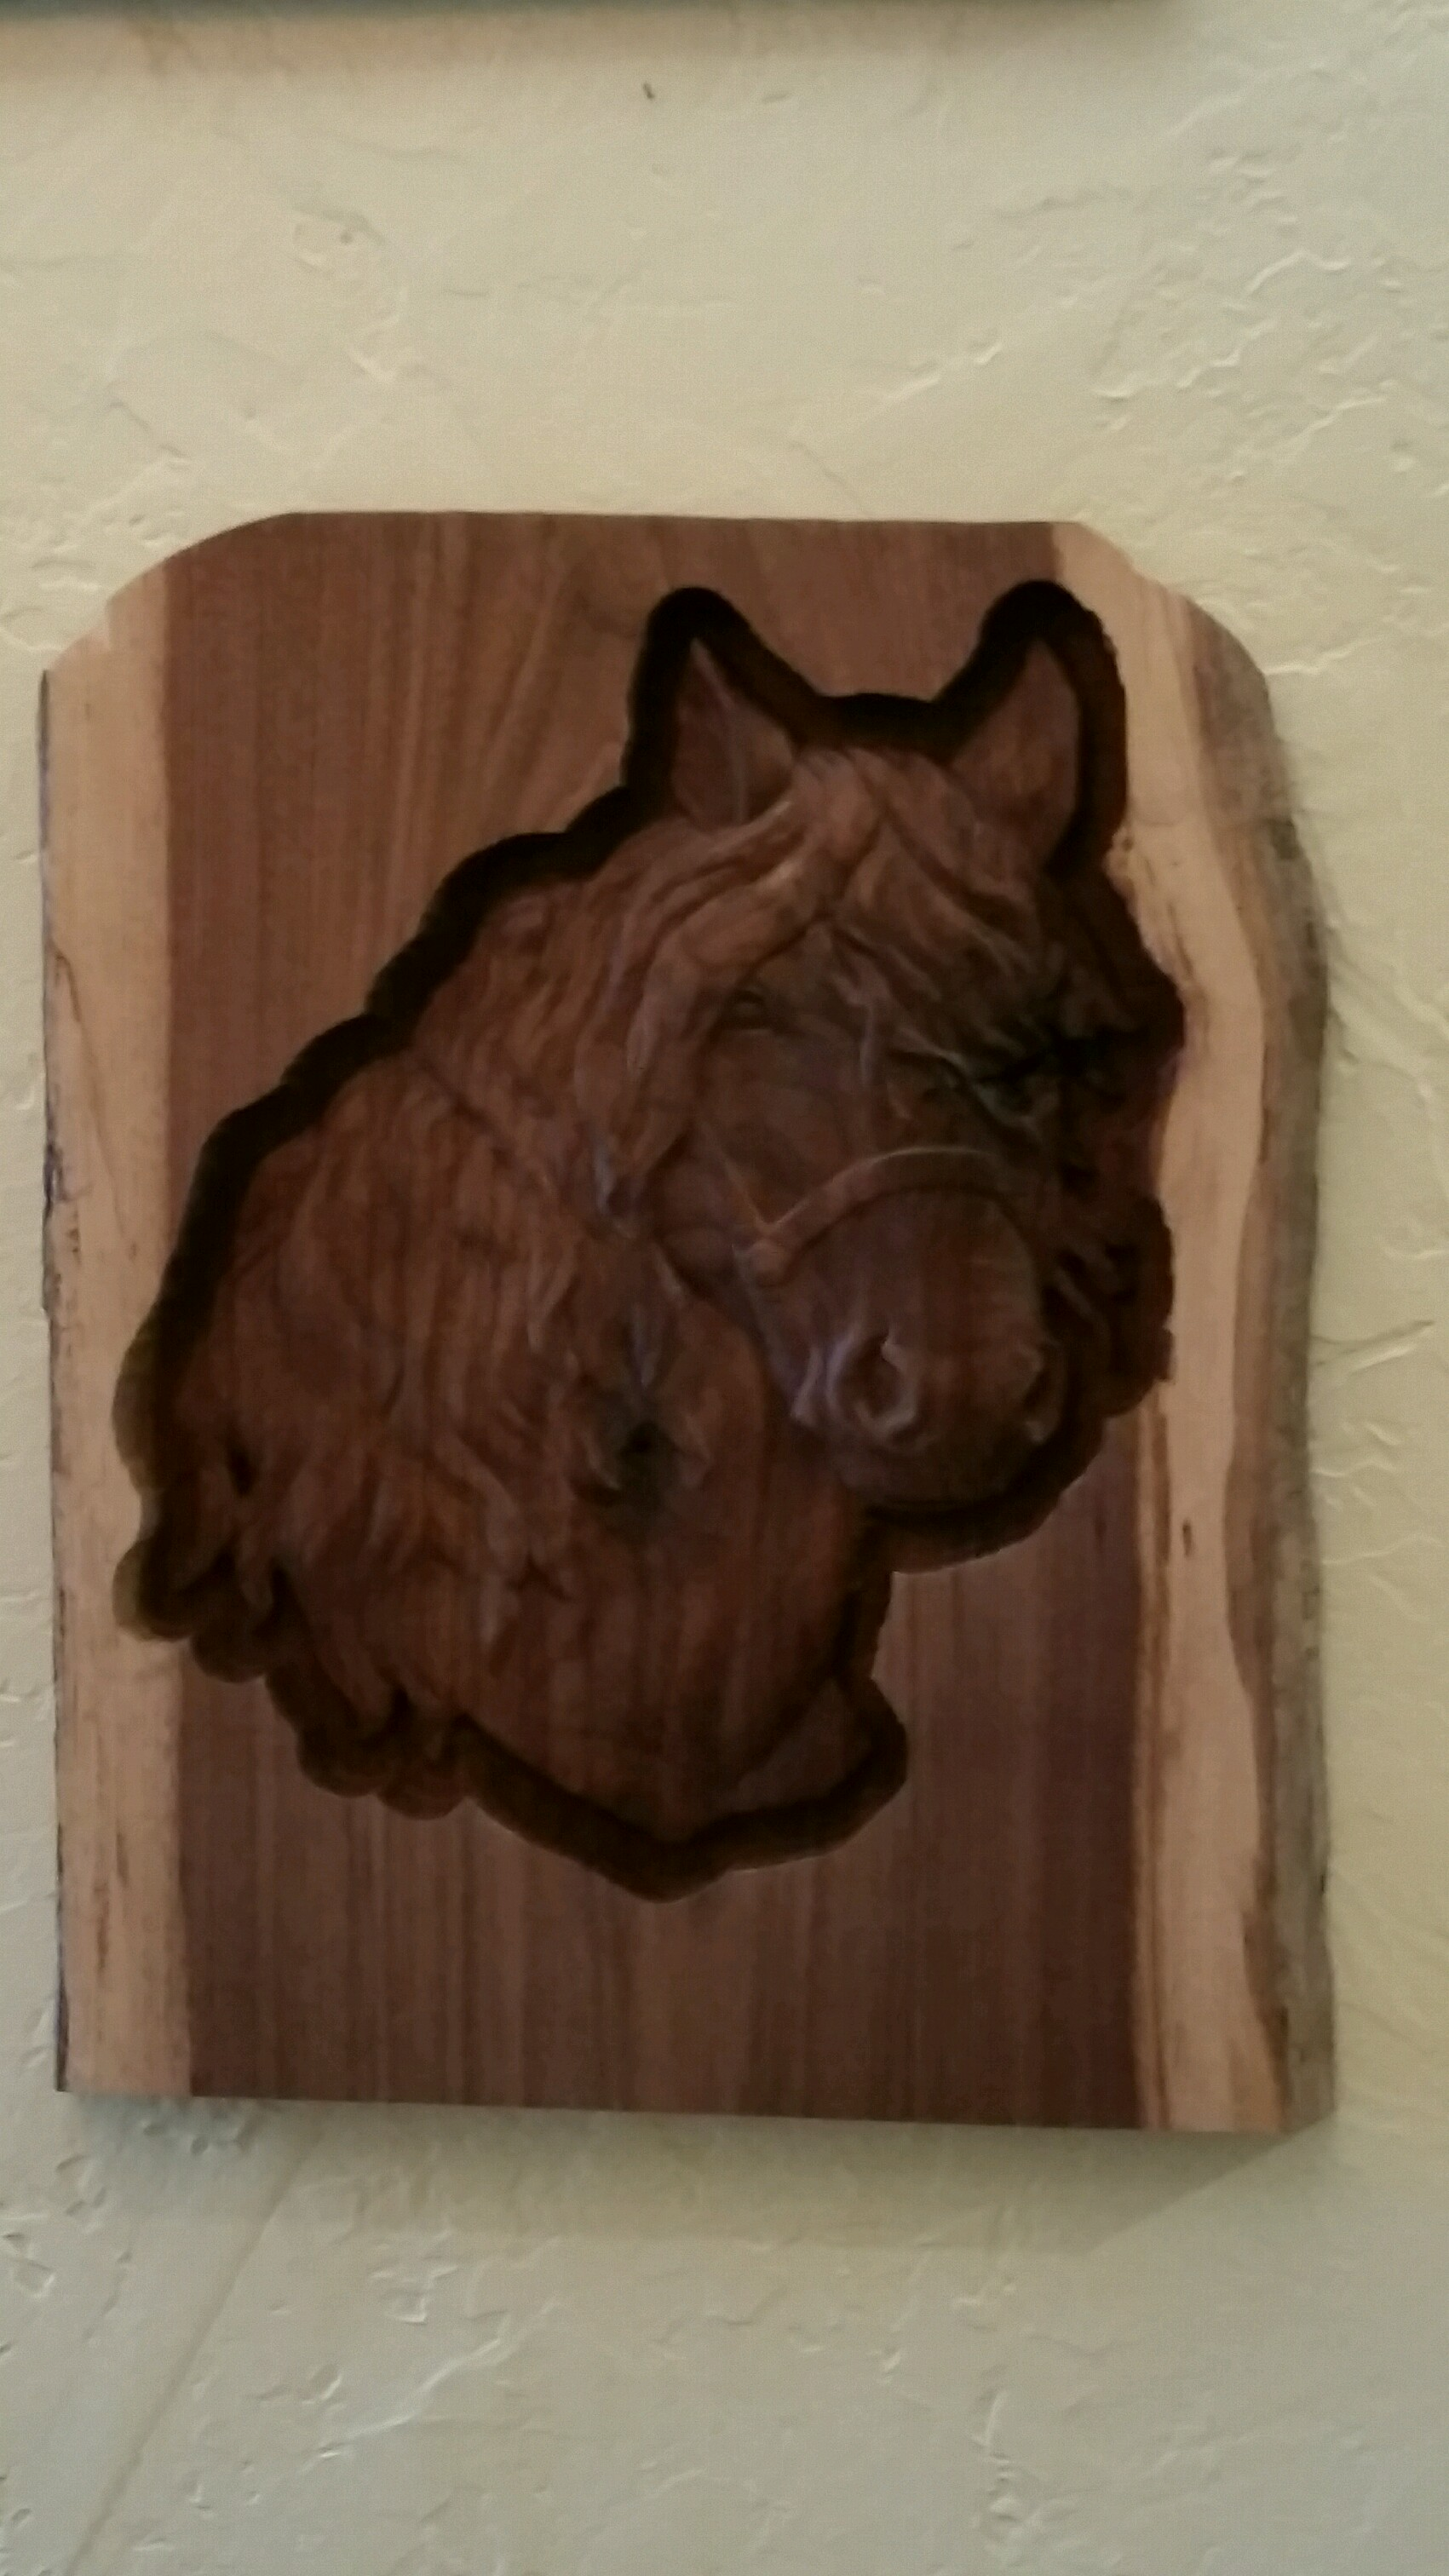 Custom wood carving custom relief woodcarving